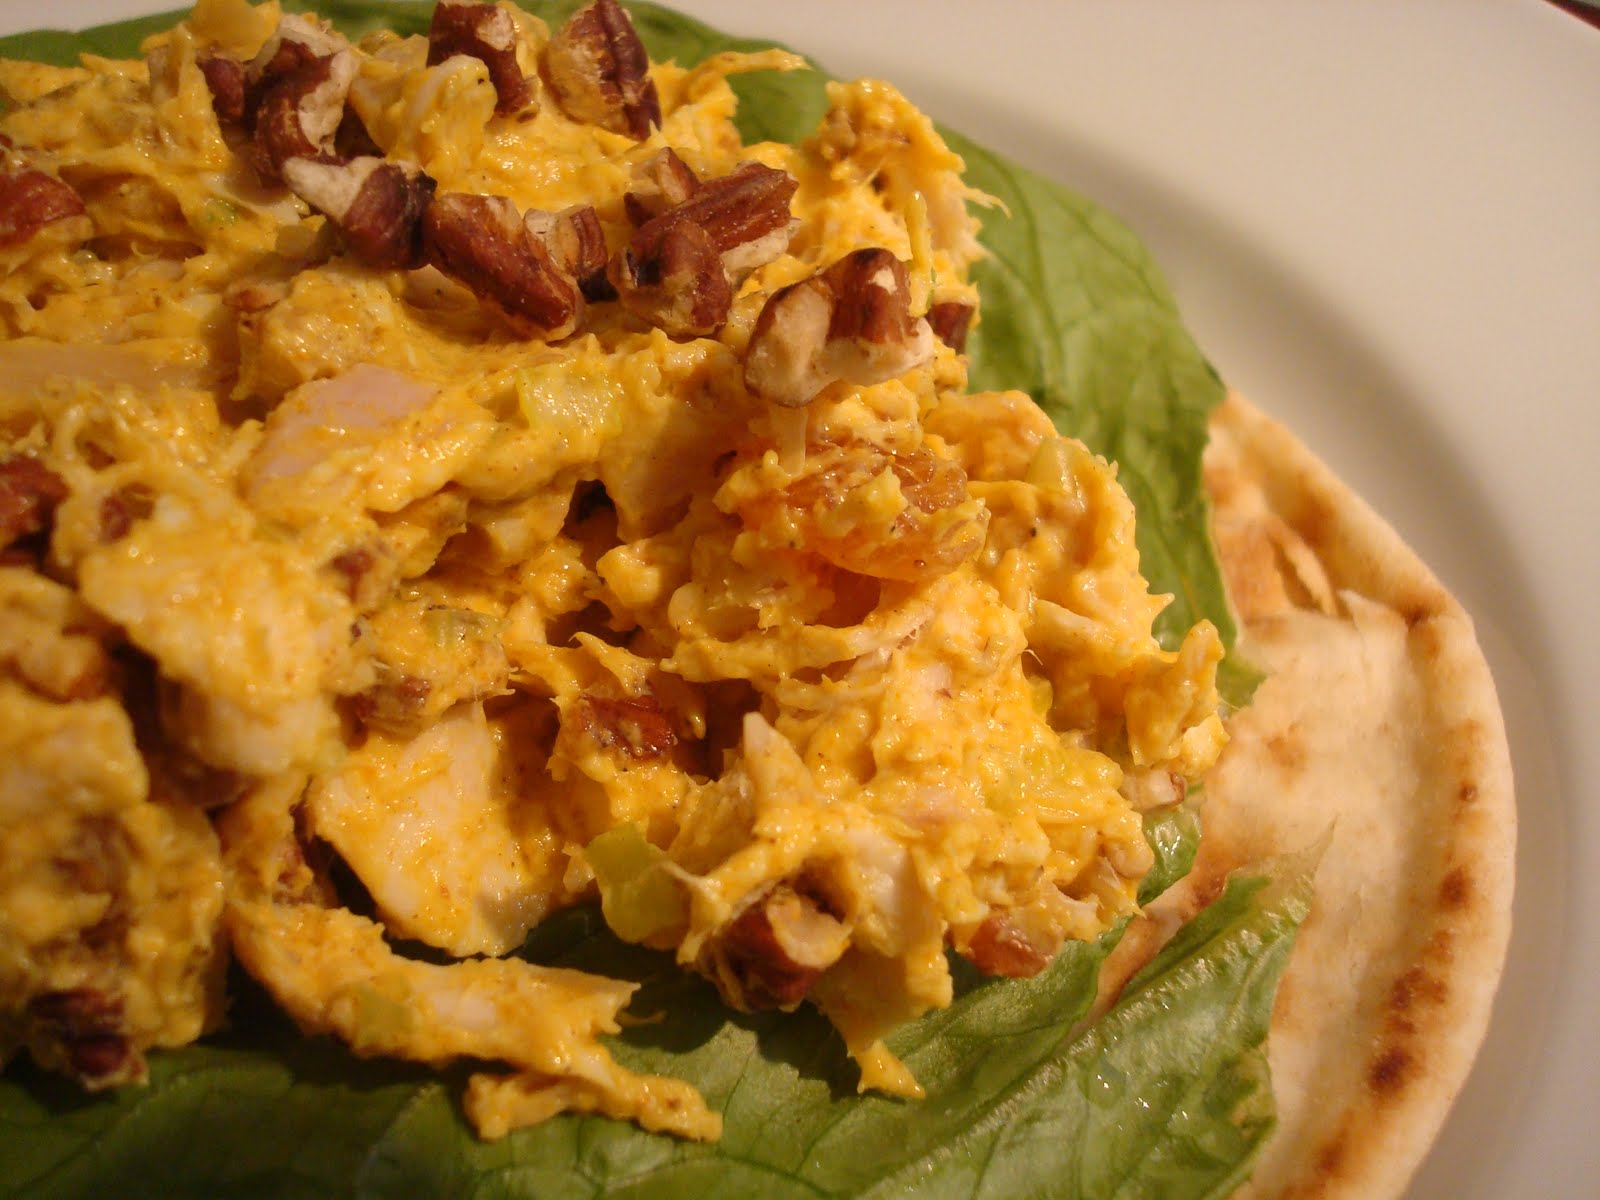 Hot Dinner Happy Home: Curried Chicken Salad with Yogurt